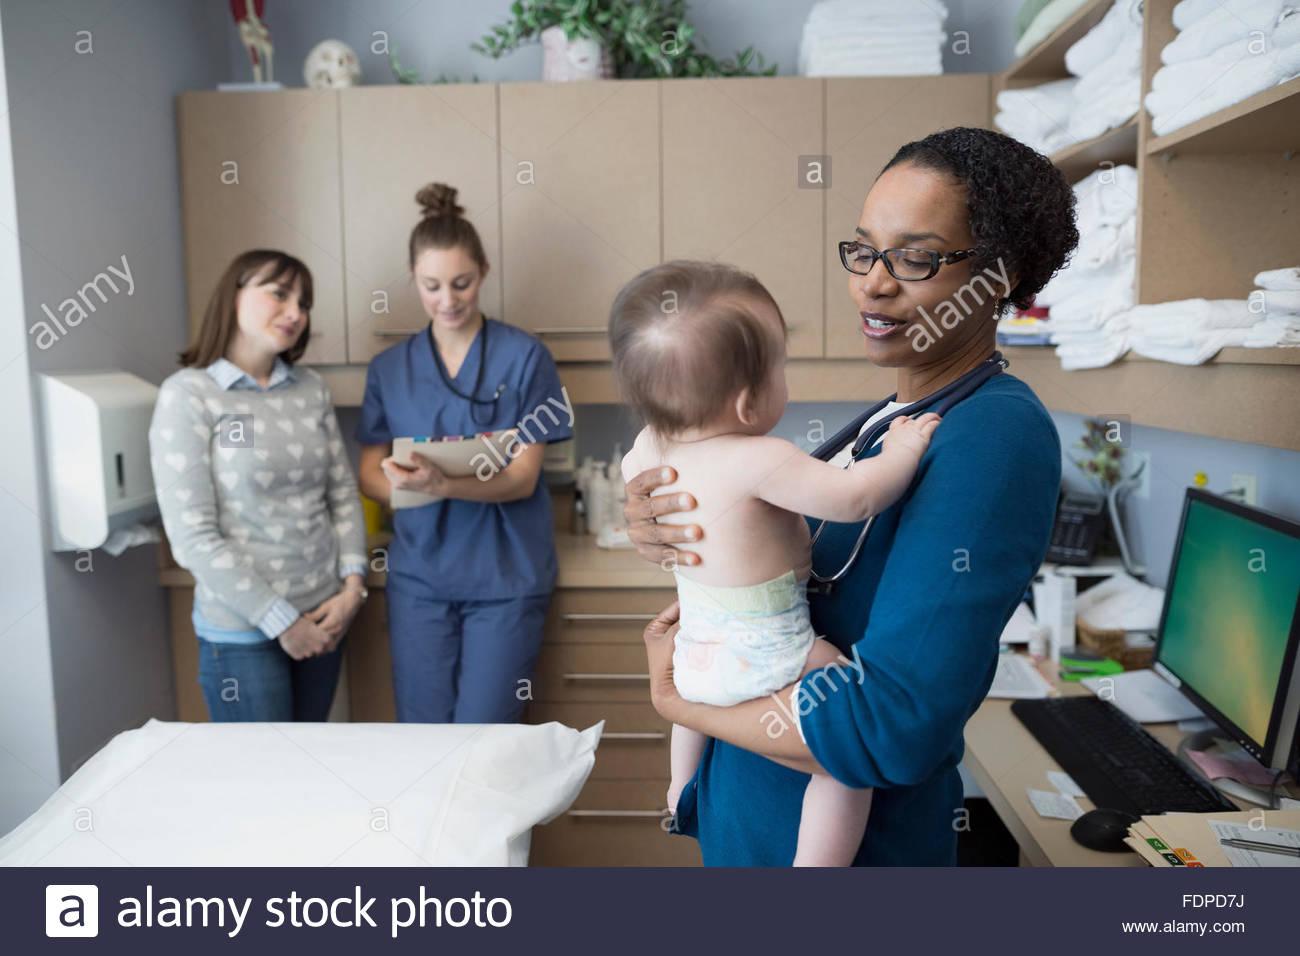 Pediatrician holding baby in examination room - Stock Image